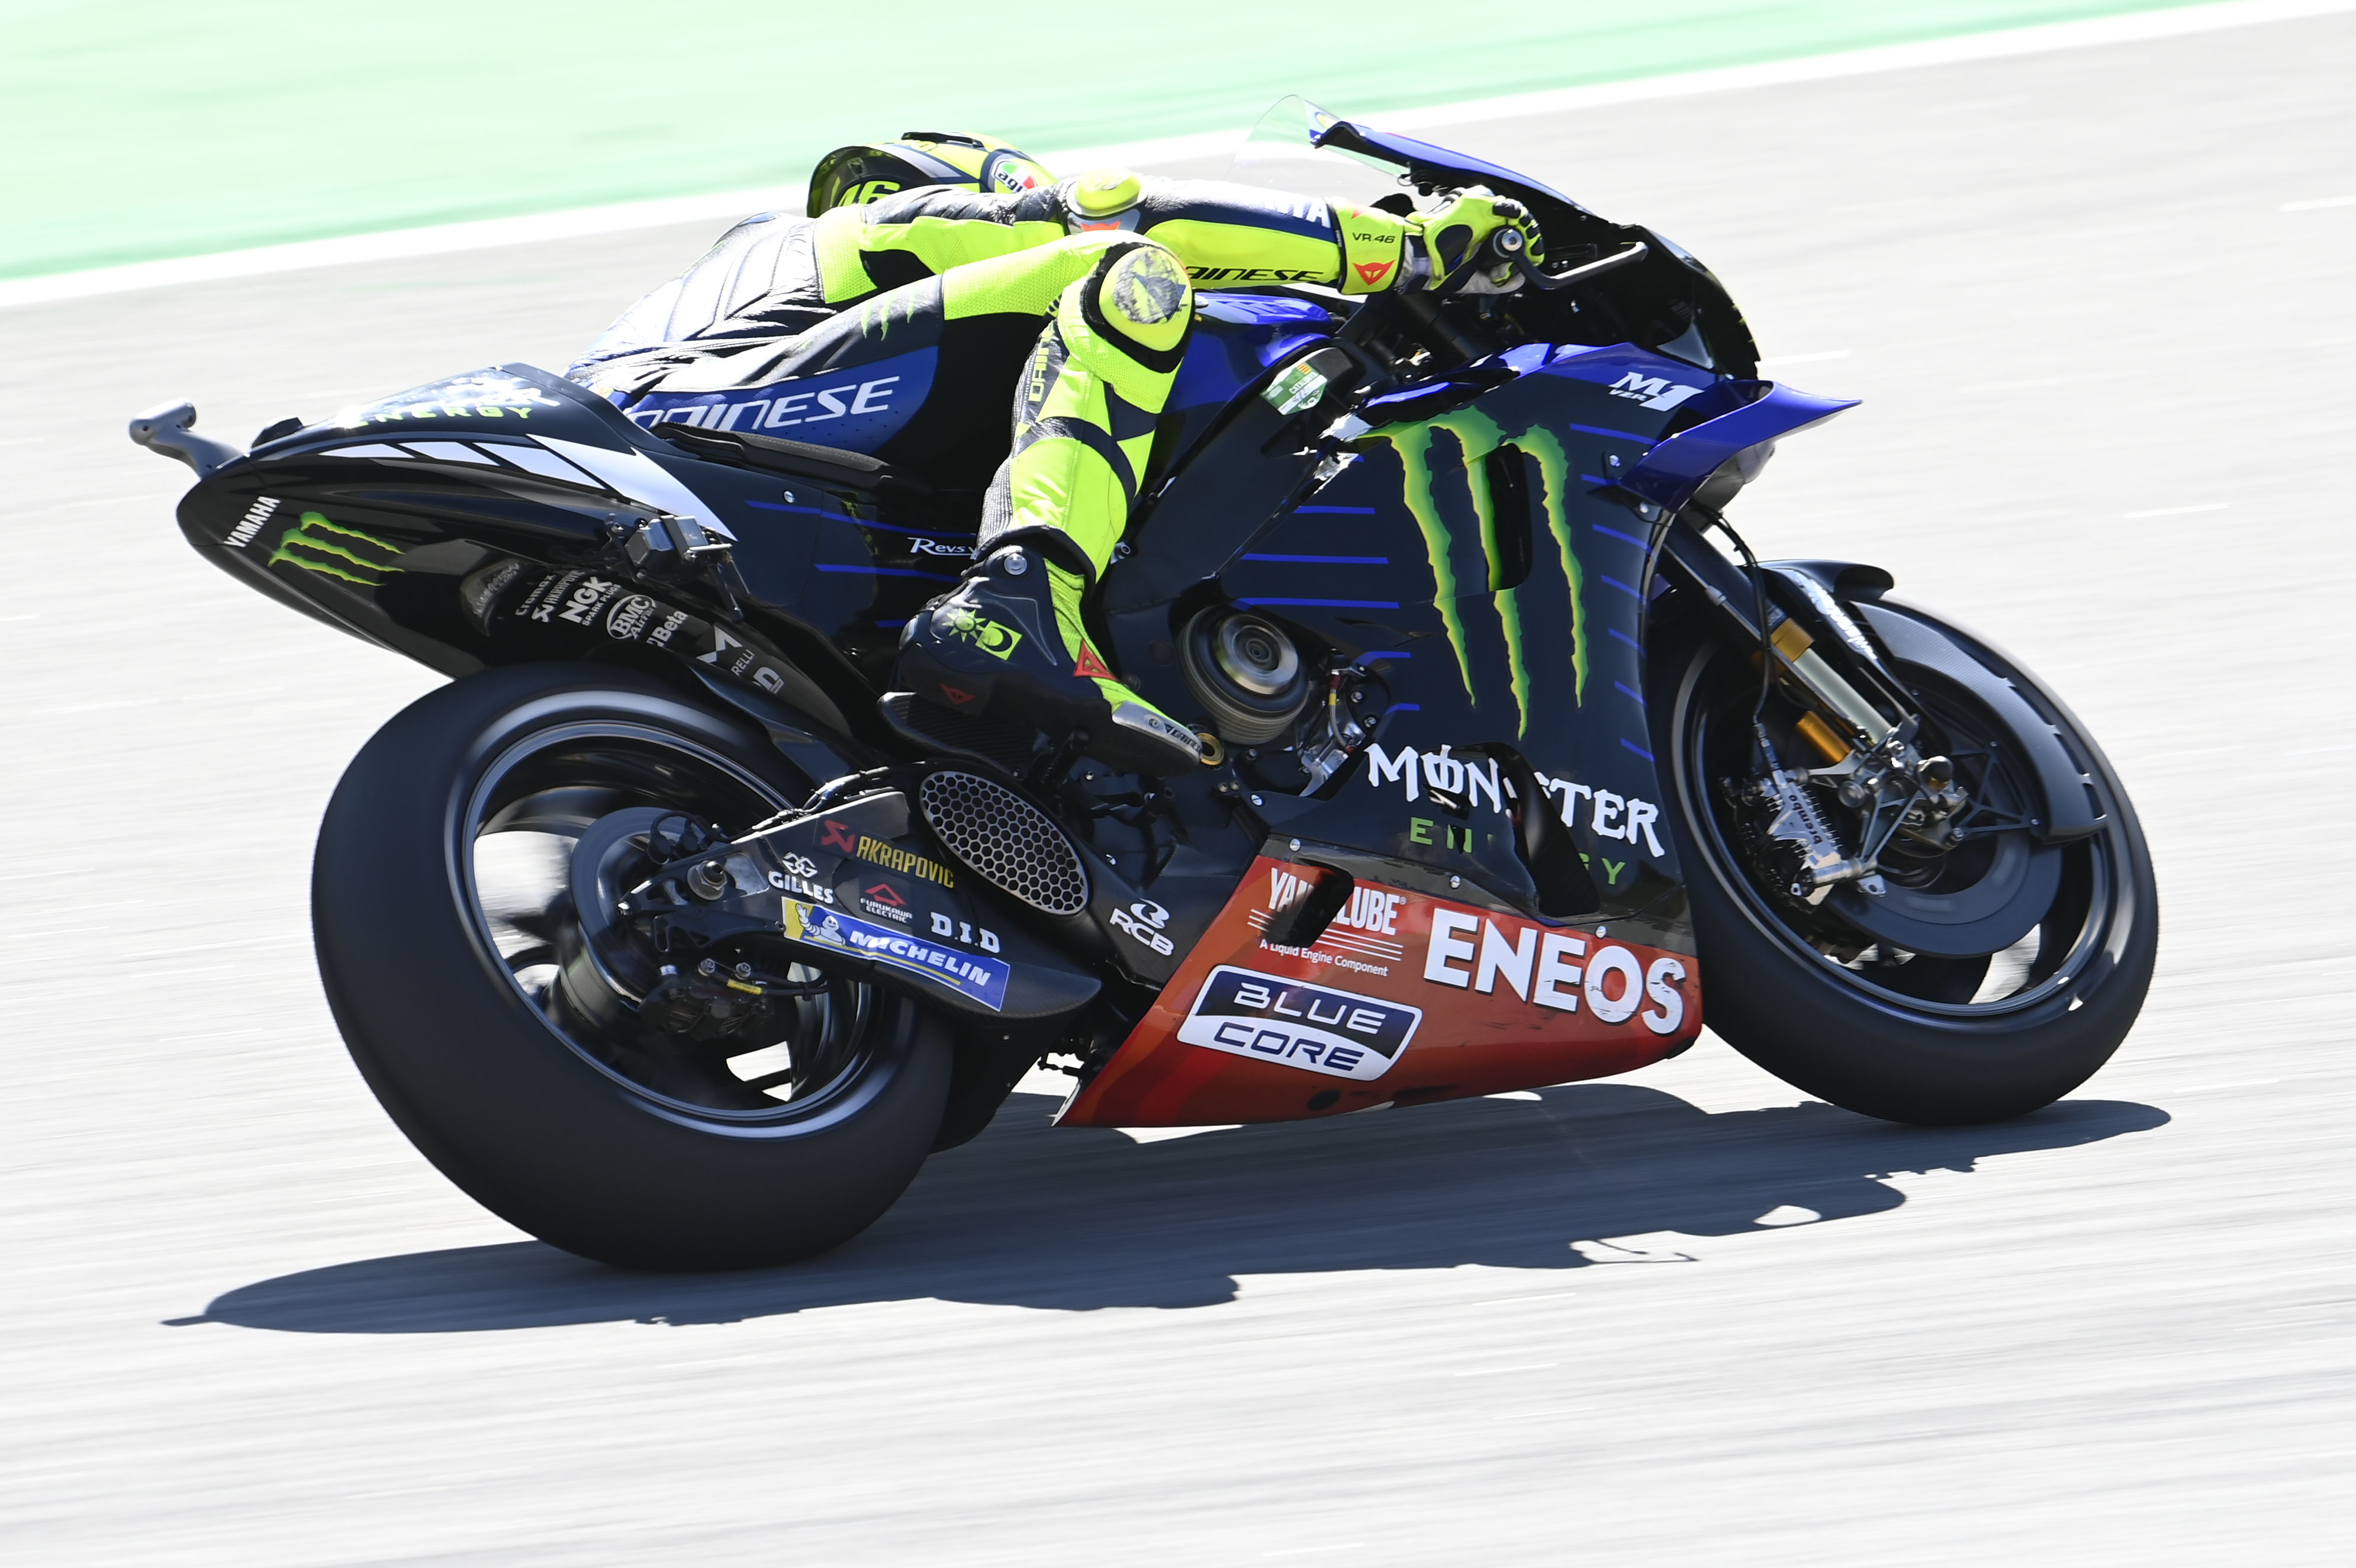 Valentino Rossi Yamaha Barcelona MotoGP 2020